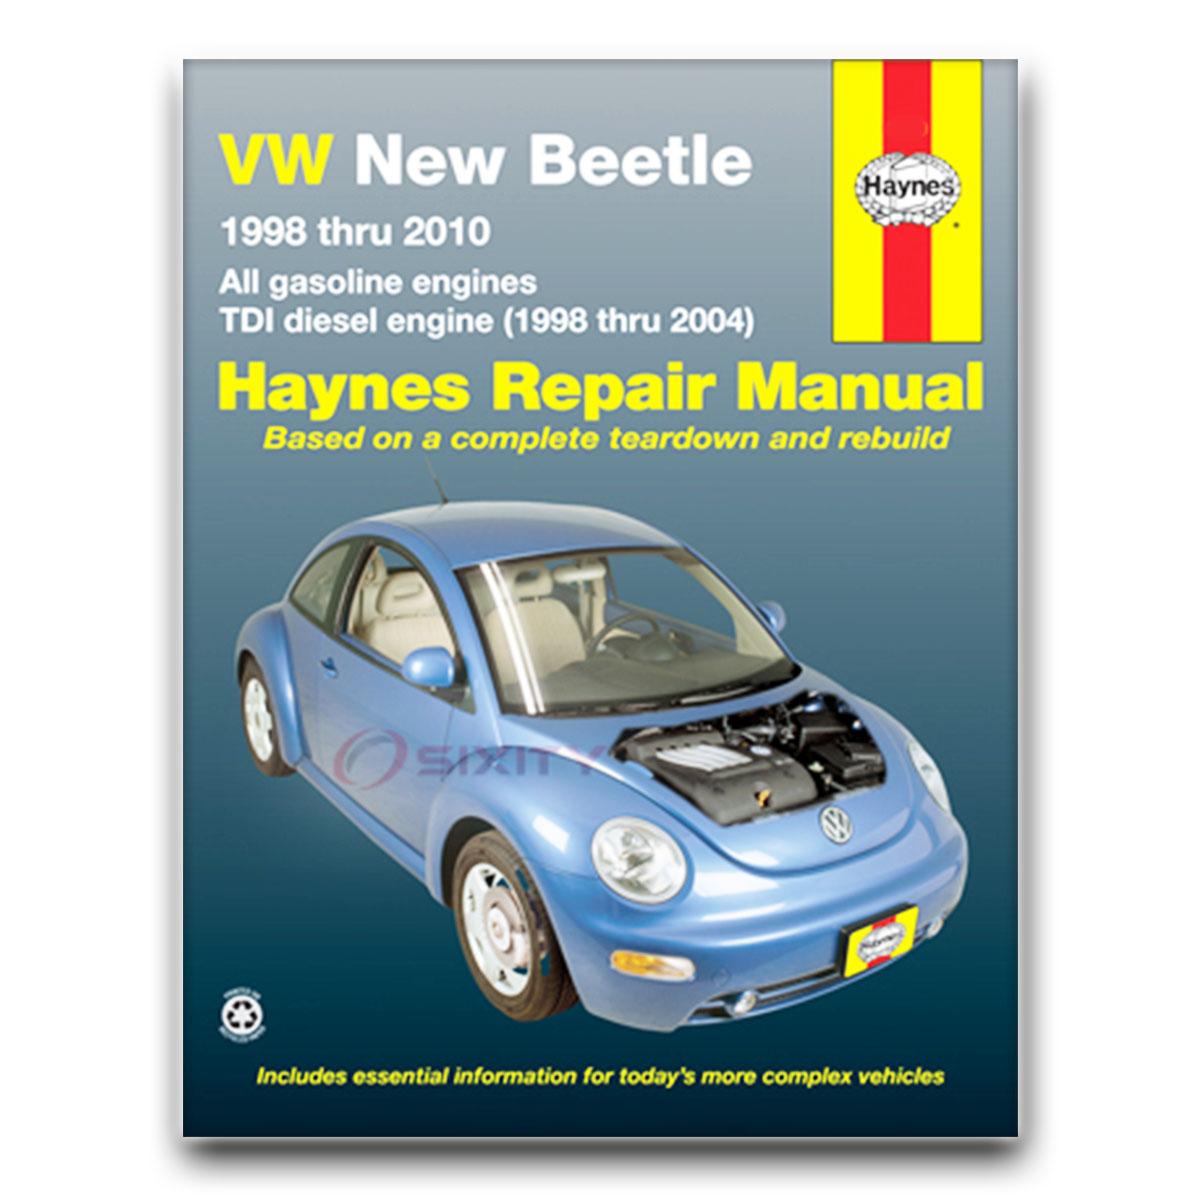 volkswagen vw beetle haynes repair manual base 2 5 glx sport turbo rh ebay com 2004 volkswagen beetle convertible repair manual 2004 Beetle Interior